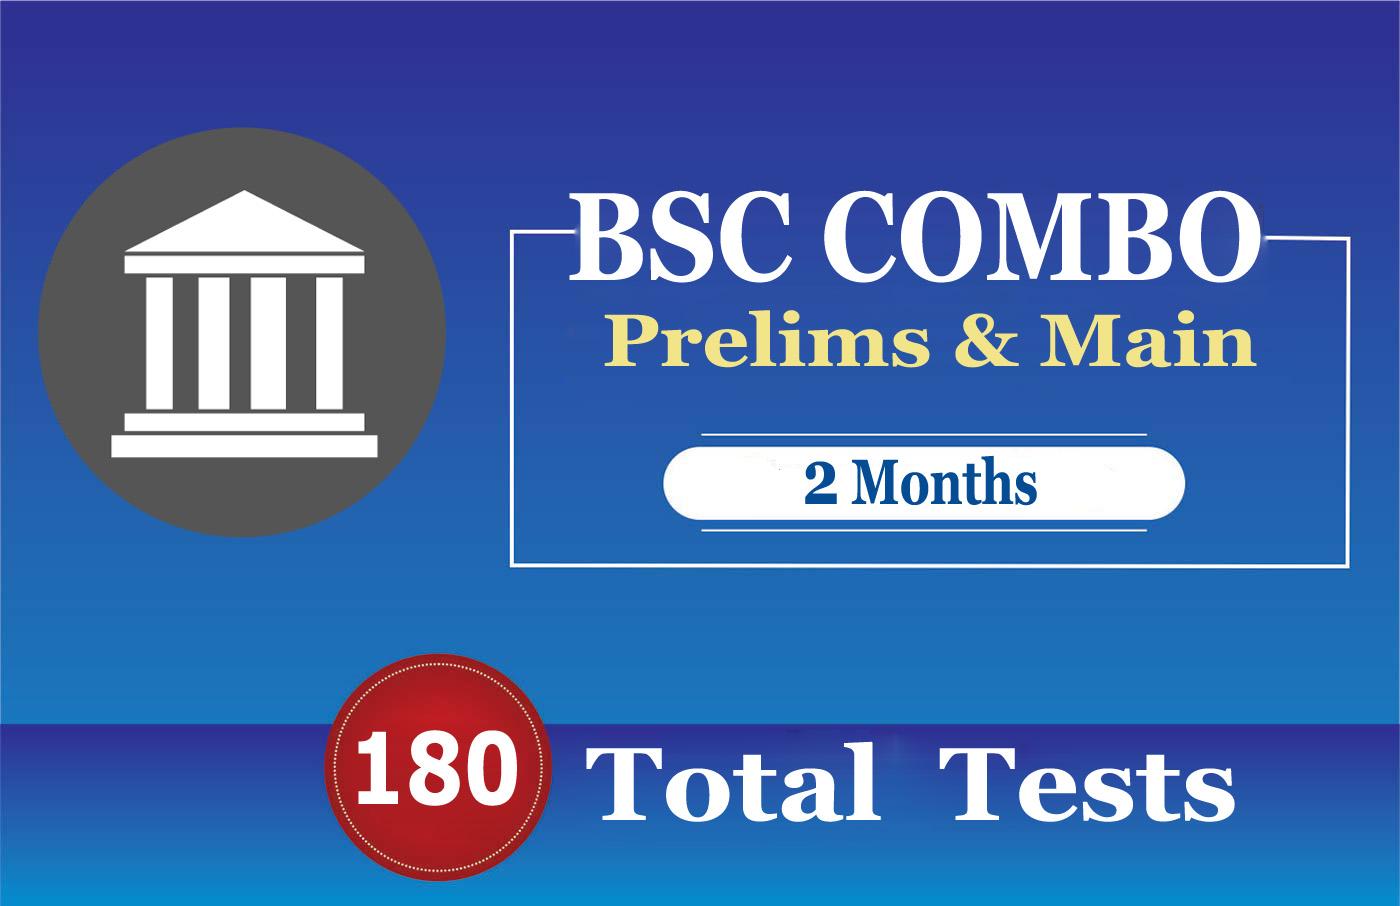 BSC COMBO